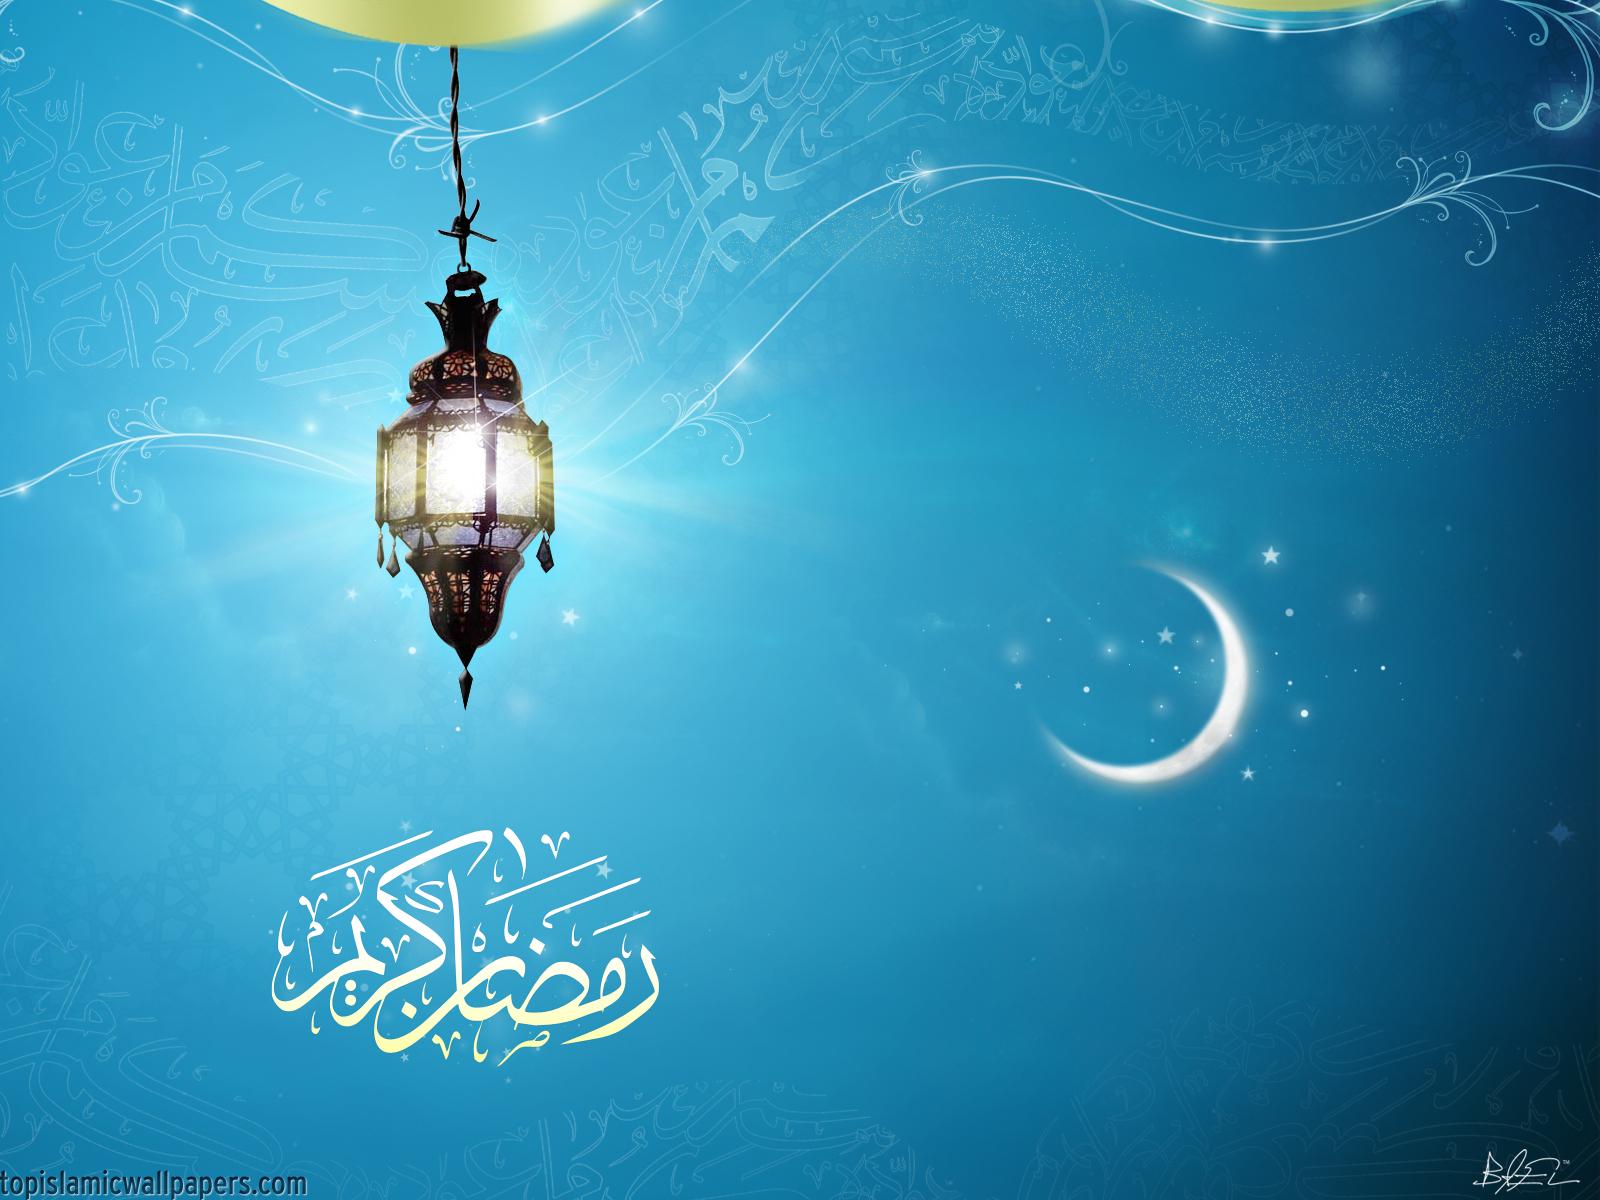 Top Ramadan Wallpaper Free Download, Islam HD Desktop ...Very Good 3d Islamic Wallpapers Collection